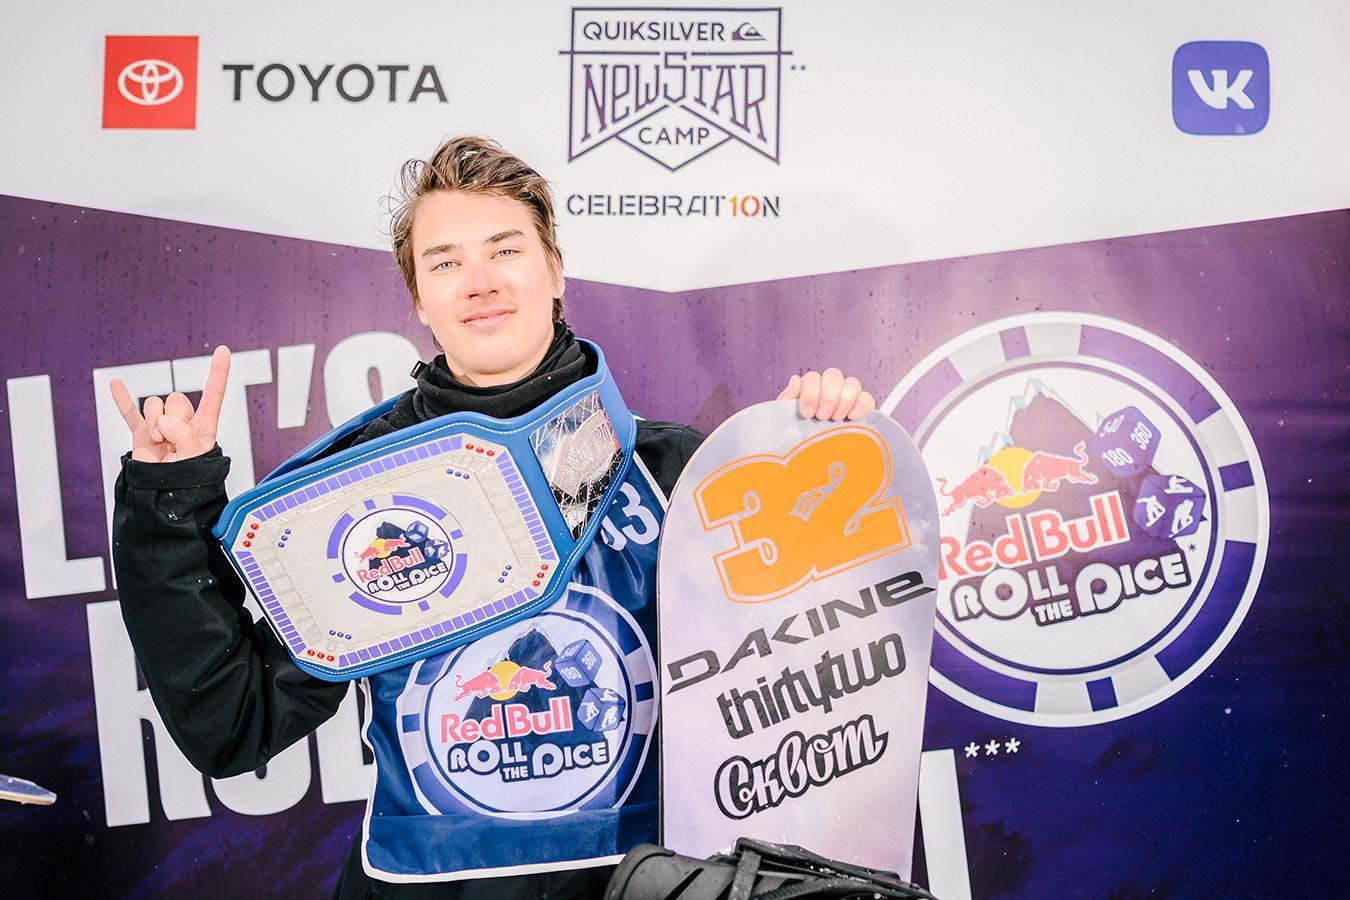 Марк Теймуров второй раз подряд выиграл турнир Red Bull Roll the Dice среди сноубордистов